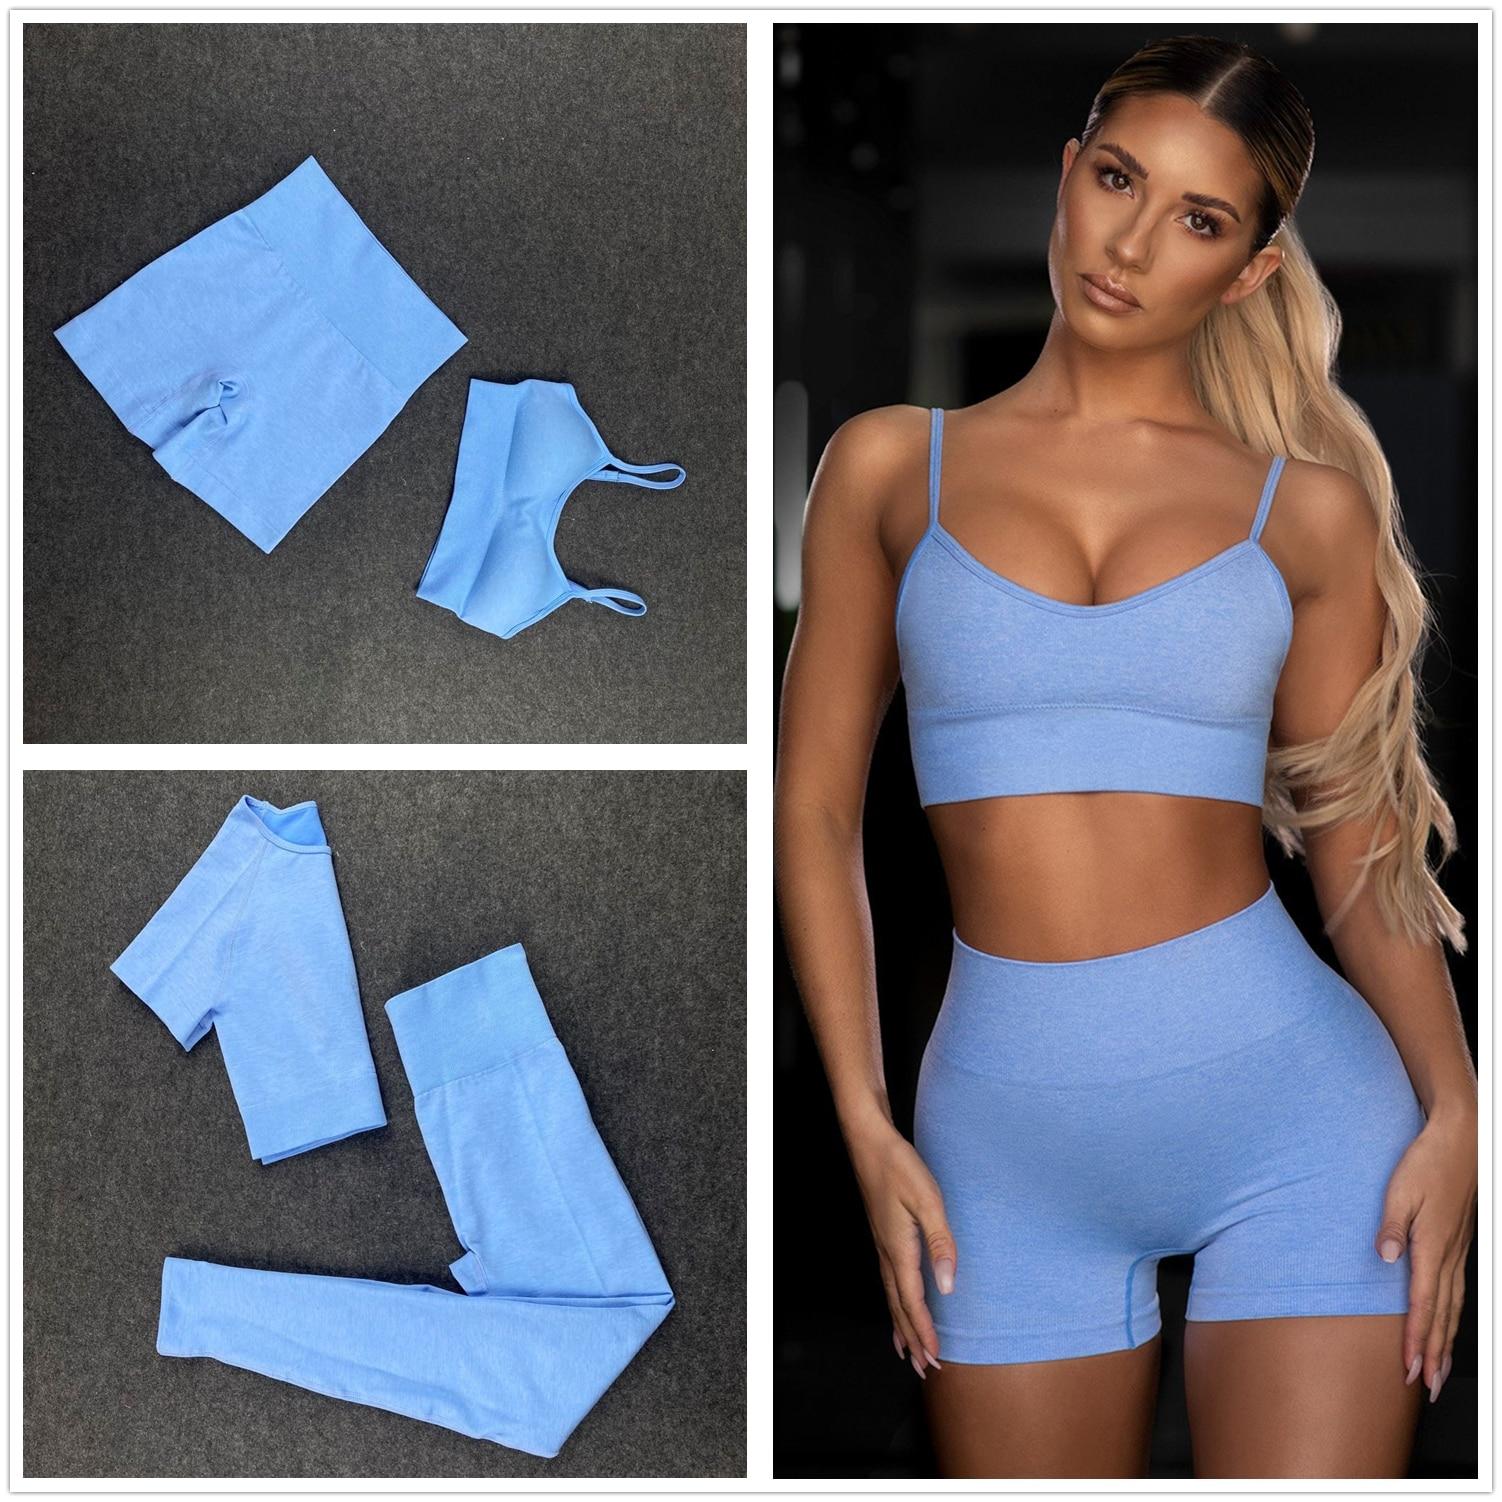 Seamless Women Yoga Set Workout Shirts Sport Pants Bra Gym Clothing Short Crop Top High Waist Running Leggings Sports Set 2005